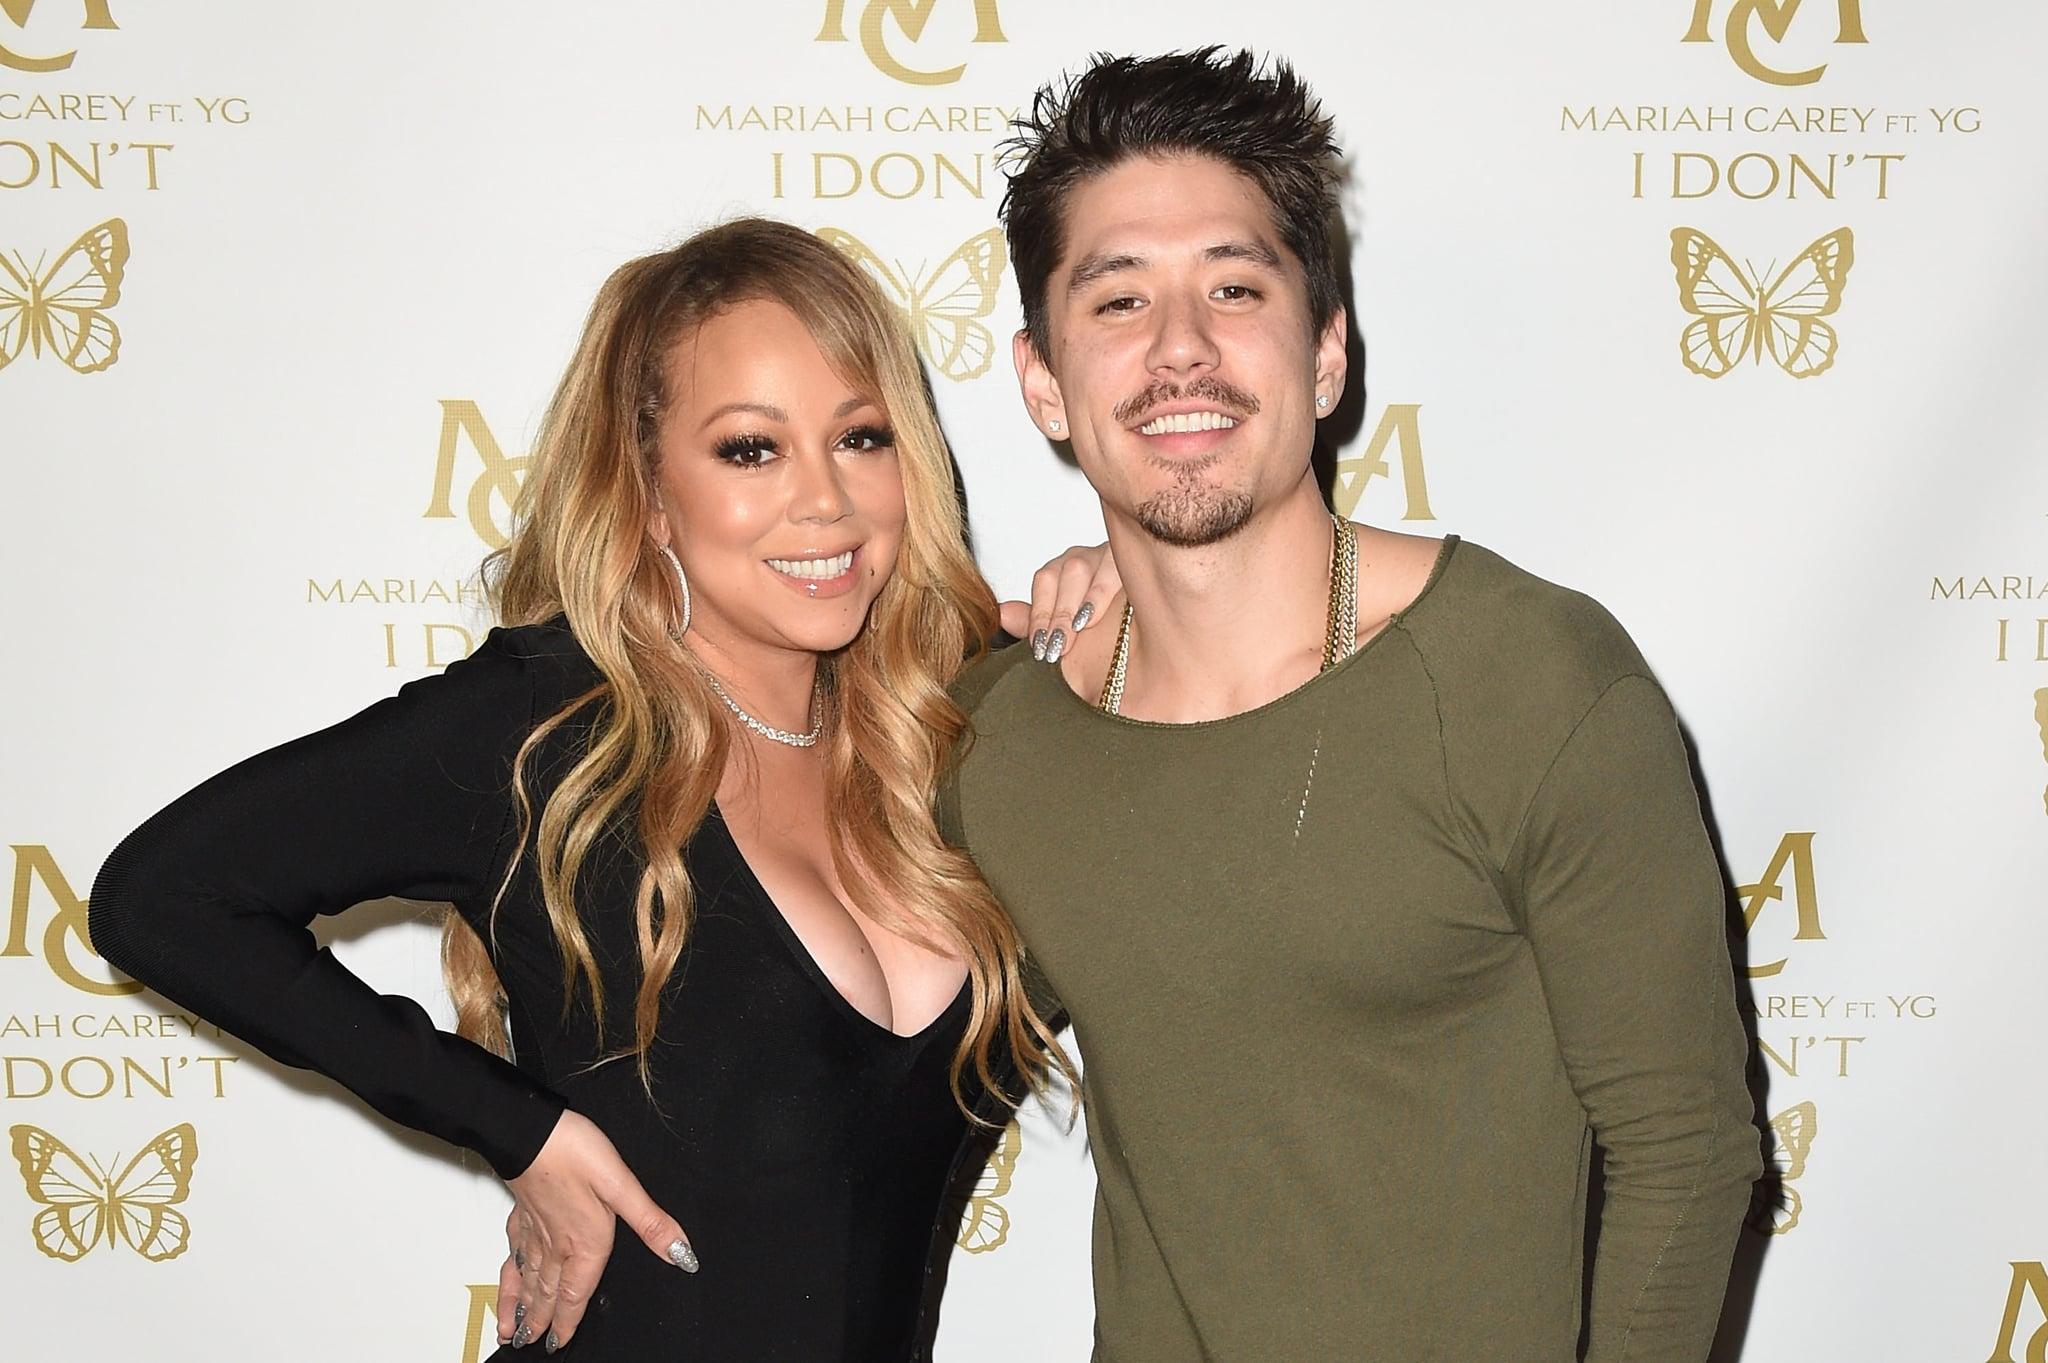 Share This Link. Mariah Carey and Bryan Tanaka Break Up   POPSUGAR Celebrity